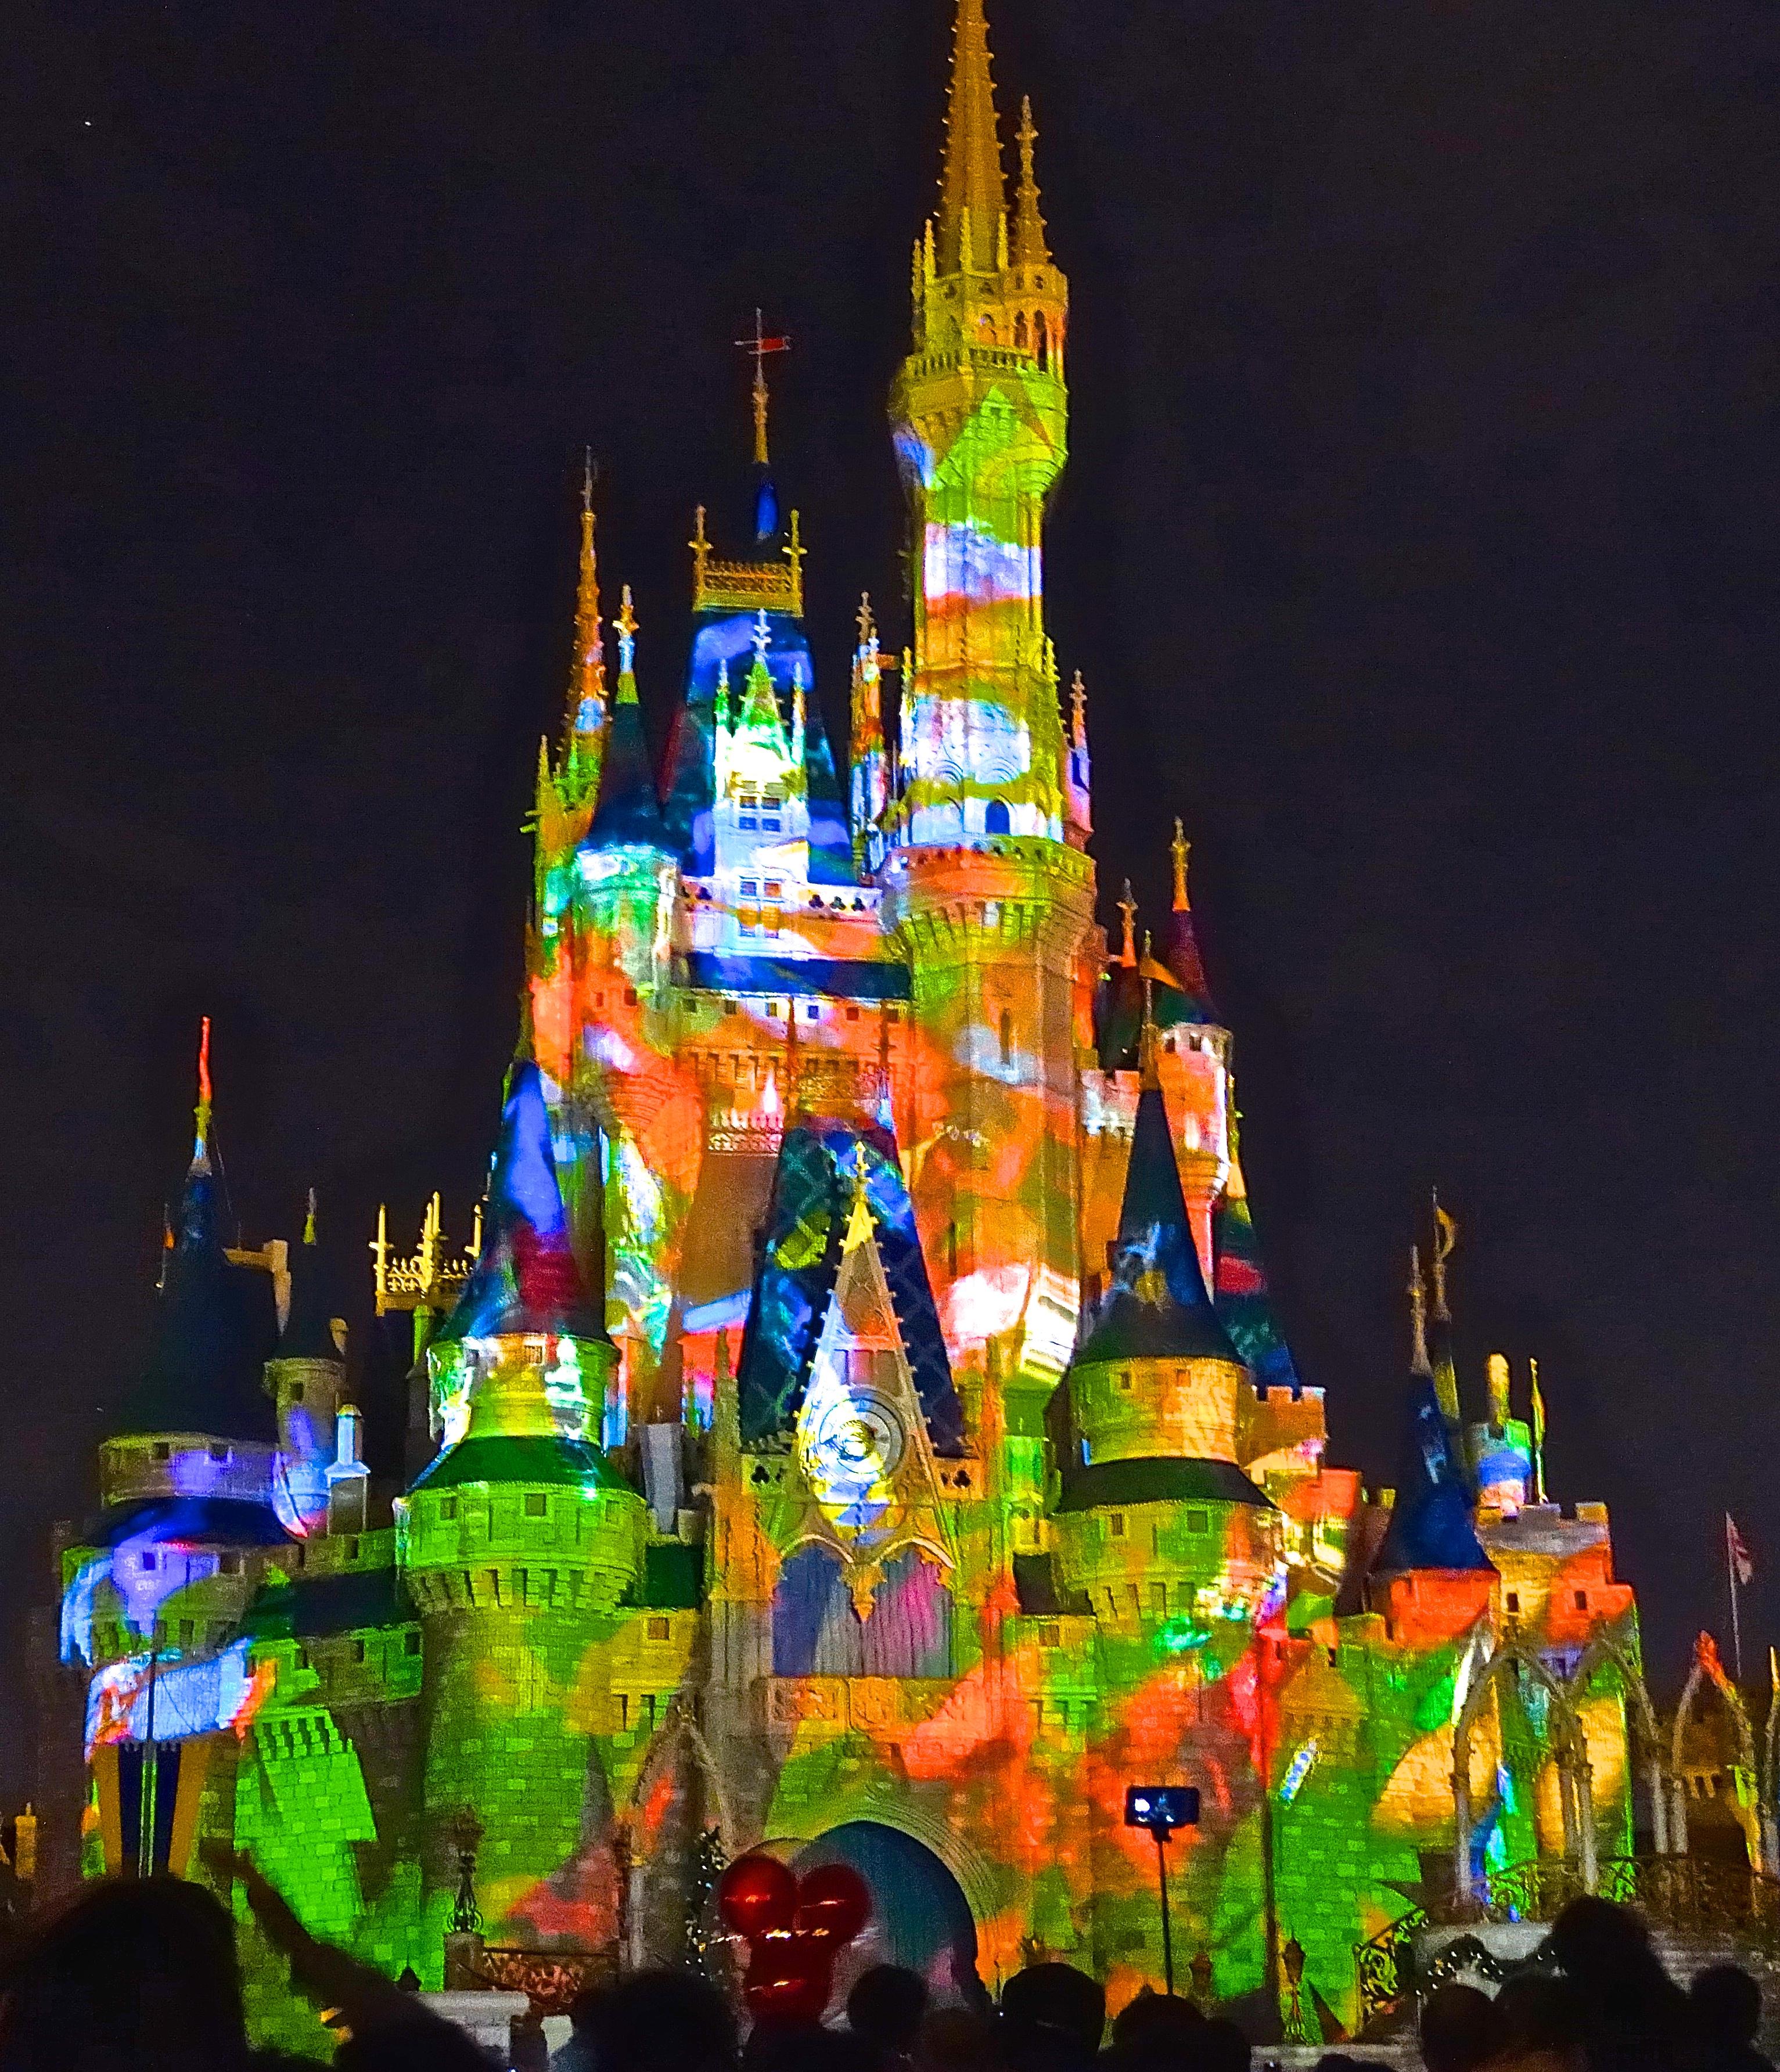 Disney's Magic Kingdom; Disney Wishes; The Magic Kingdom